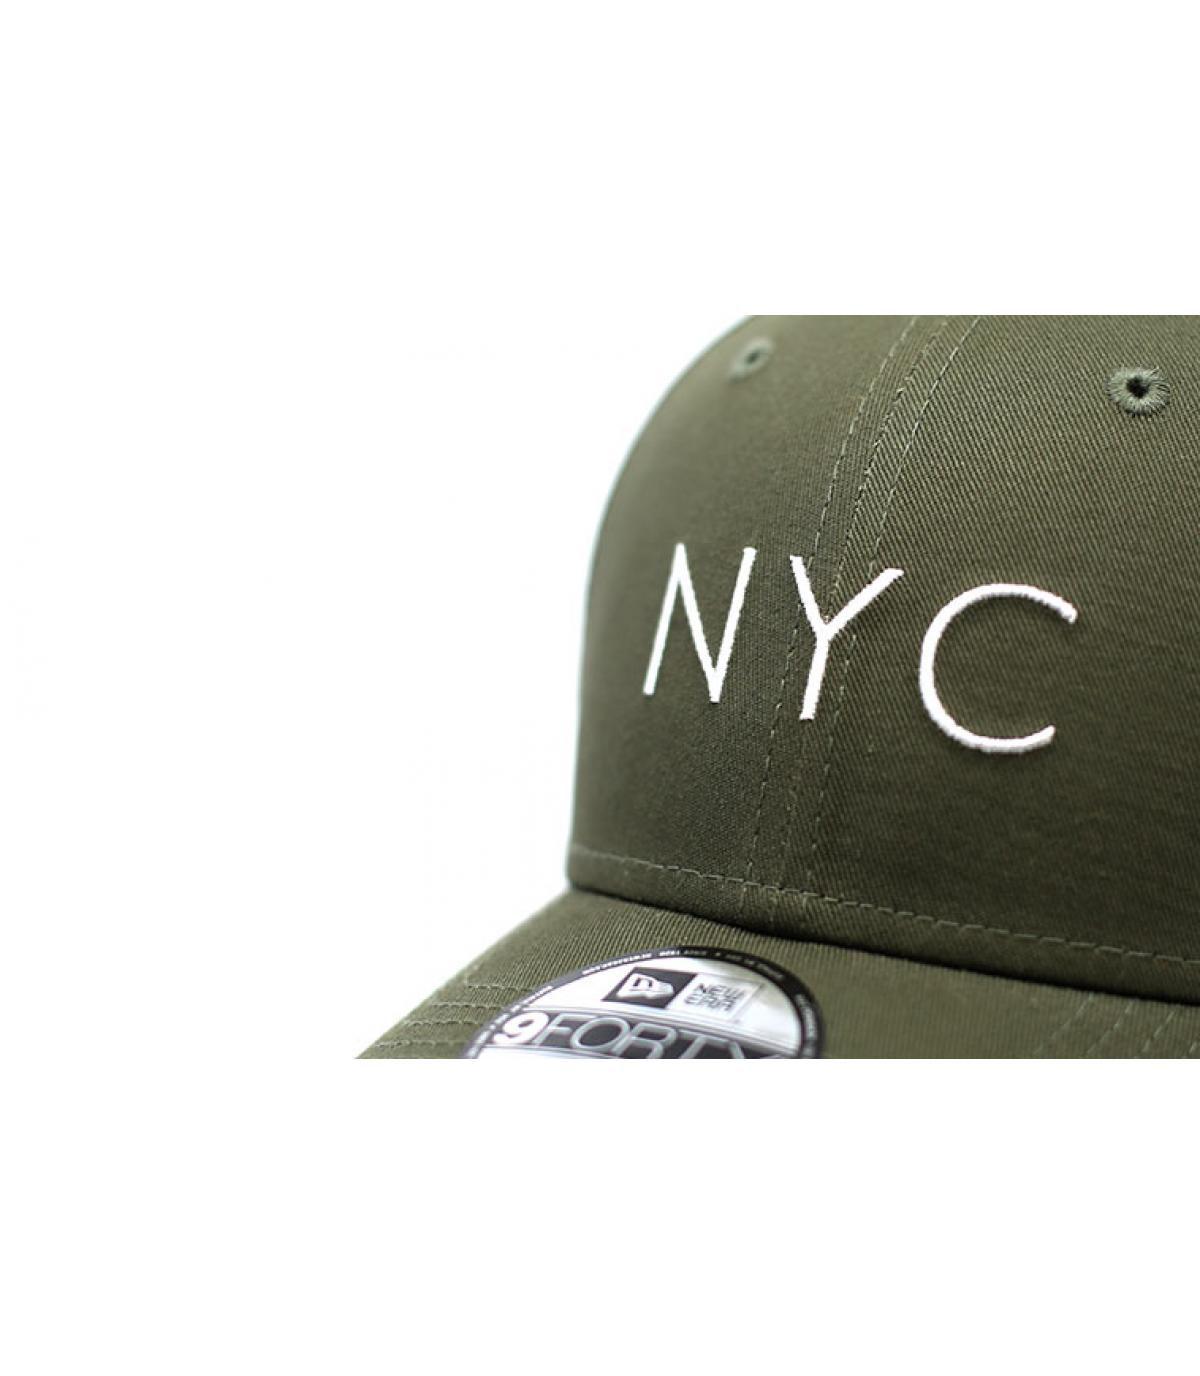 Details Cap NYC NE Ess 9Forty olive - Abbildung 3